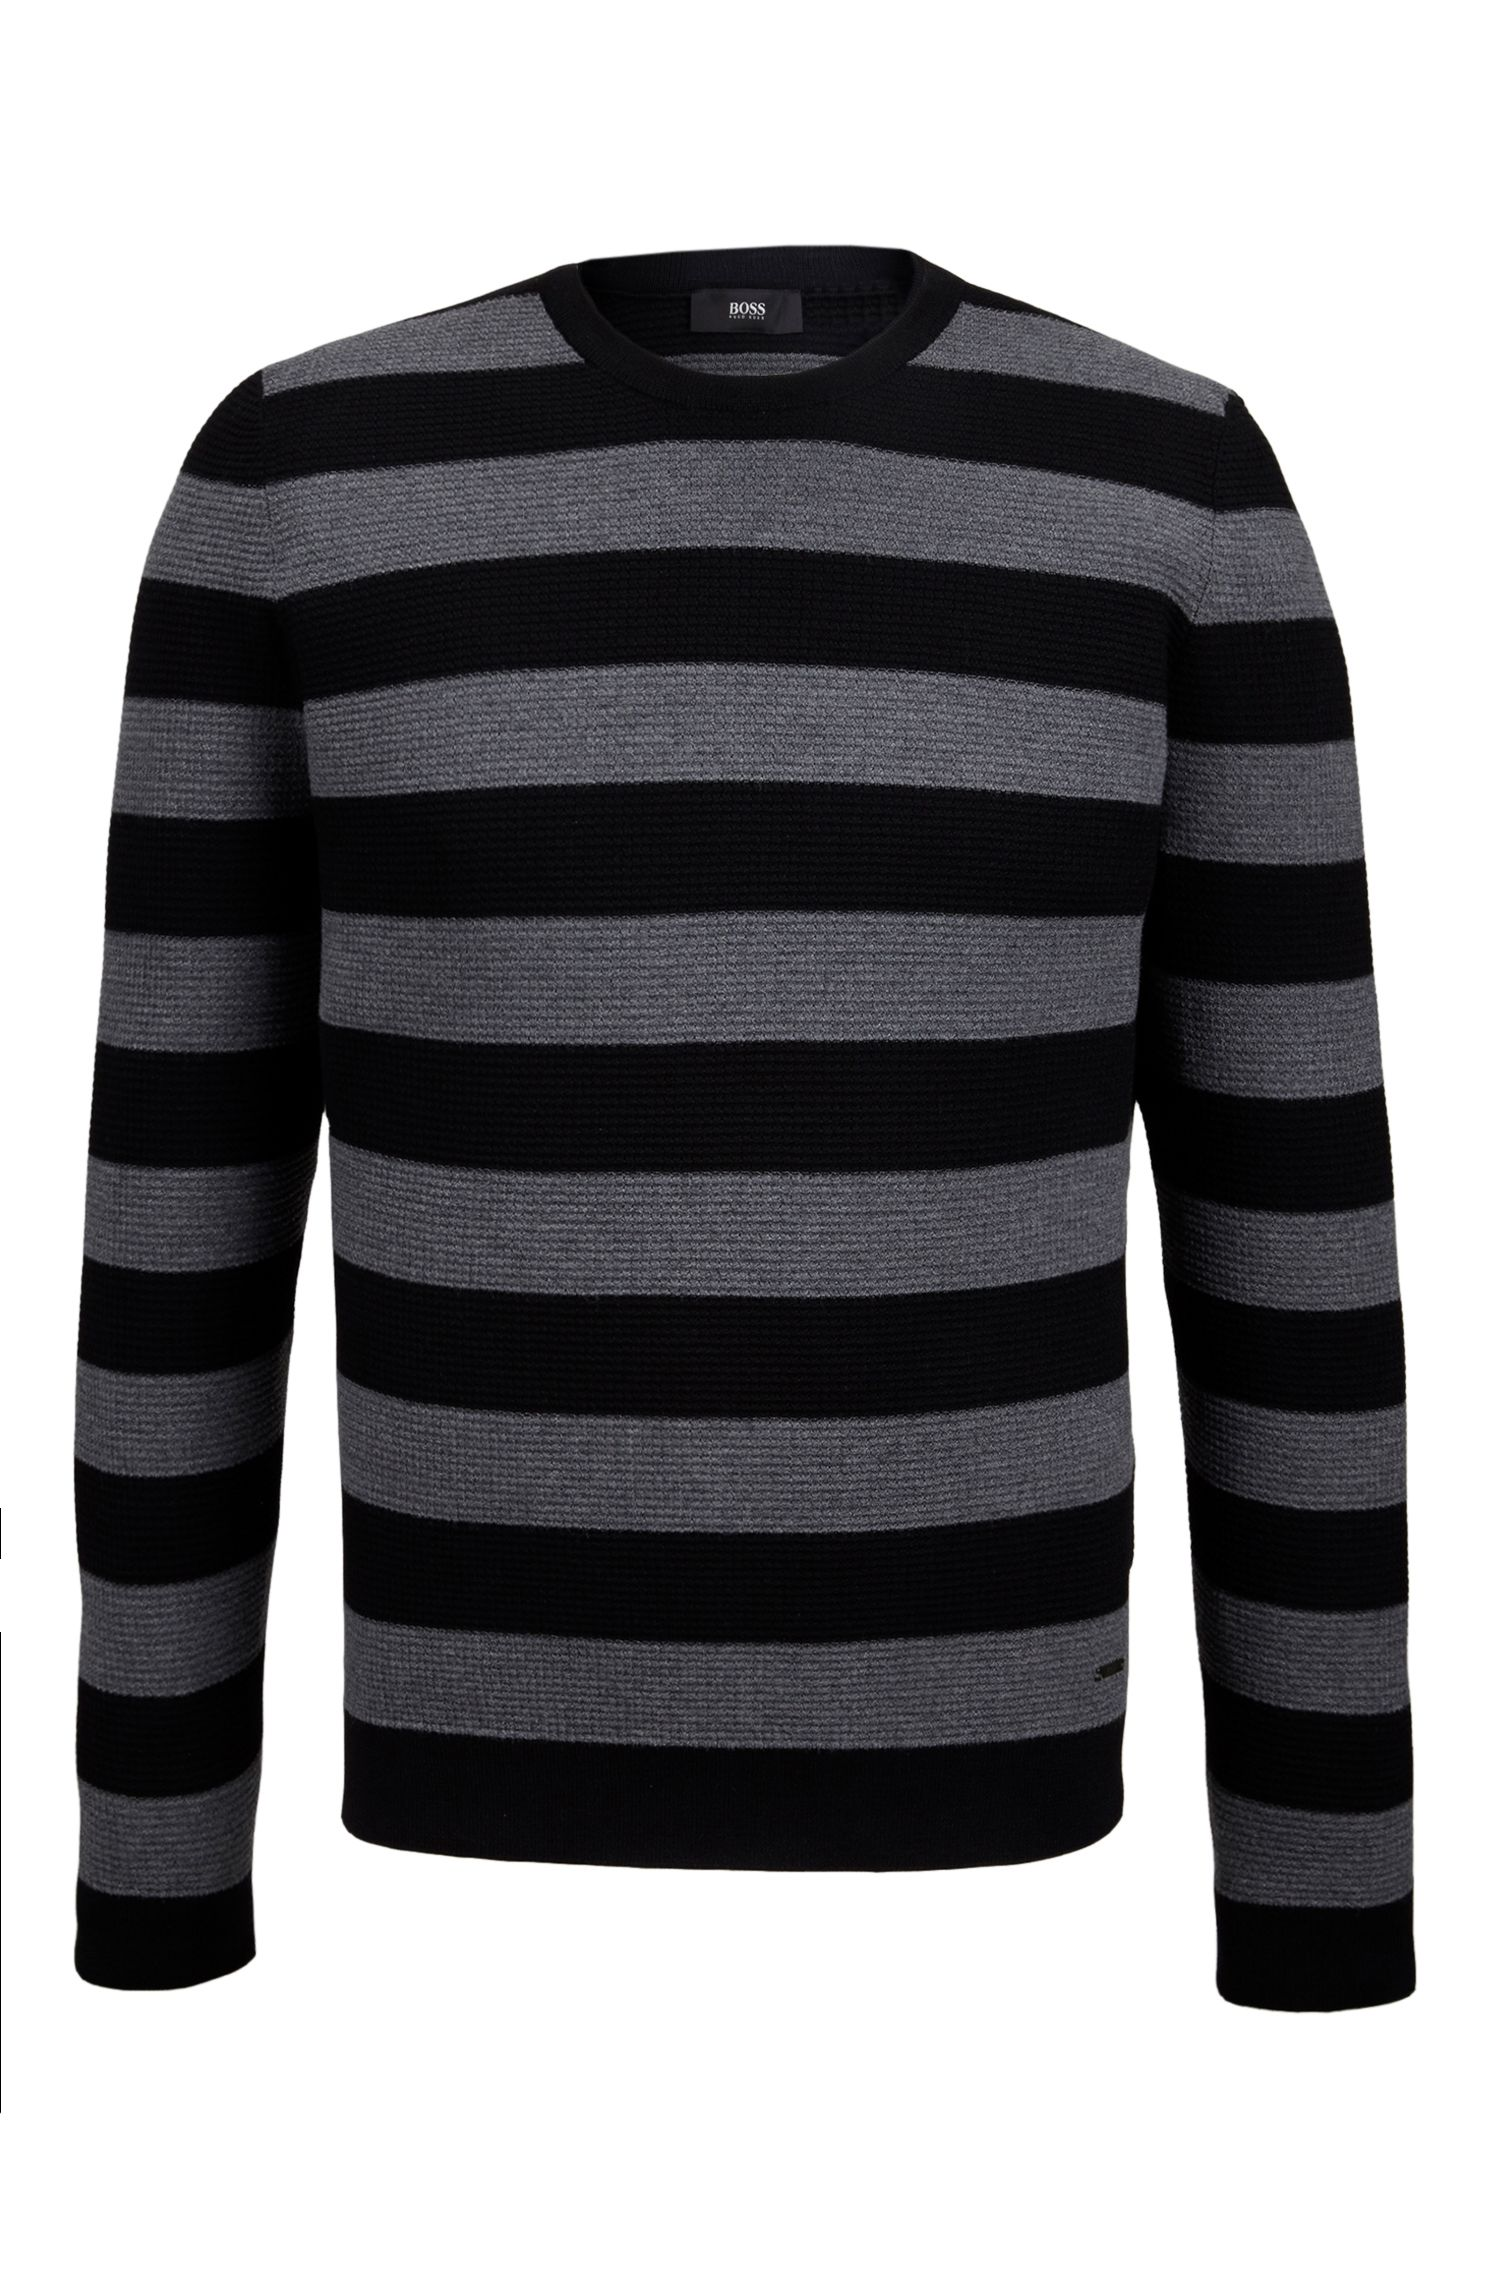 Striped Virgin Wool Sweater | Nantoni, Black